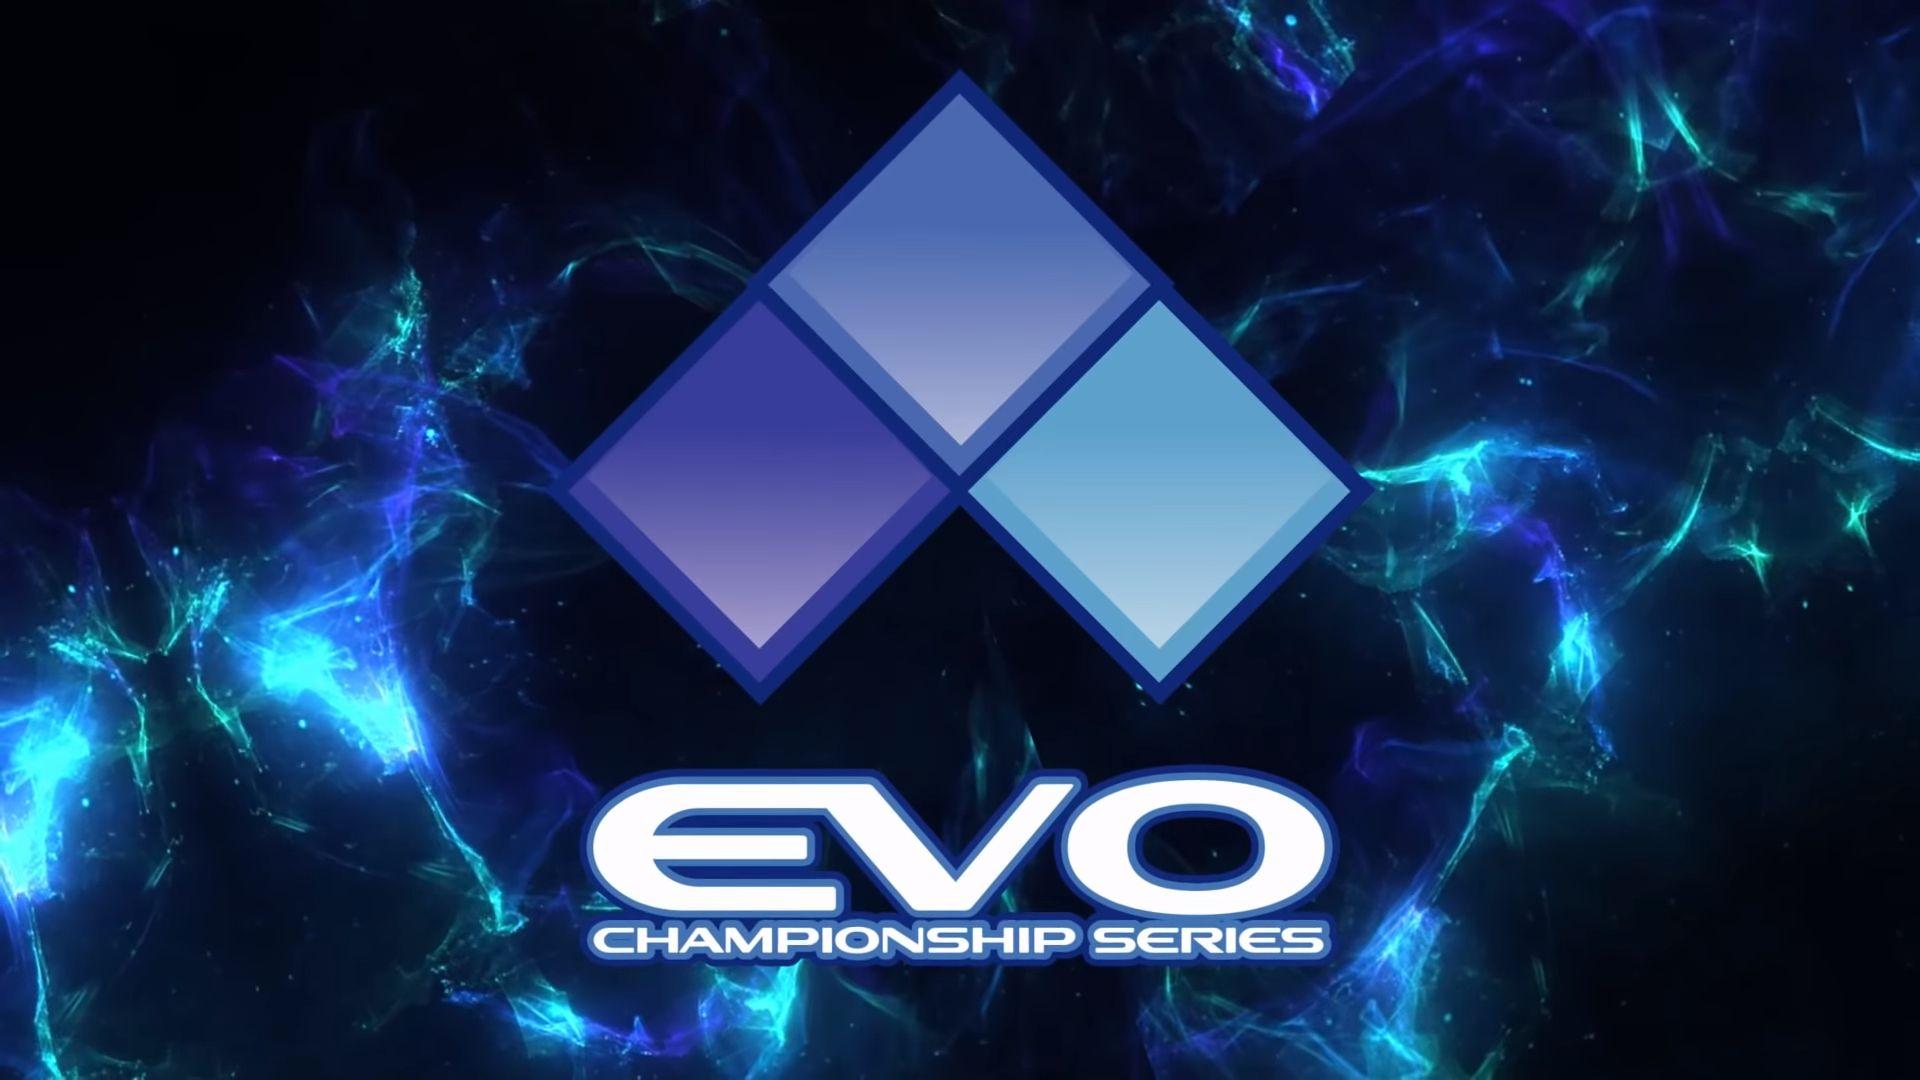 Evo Championship Services